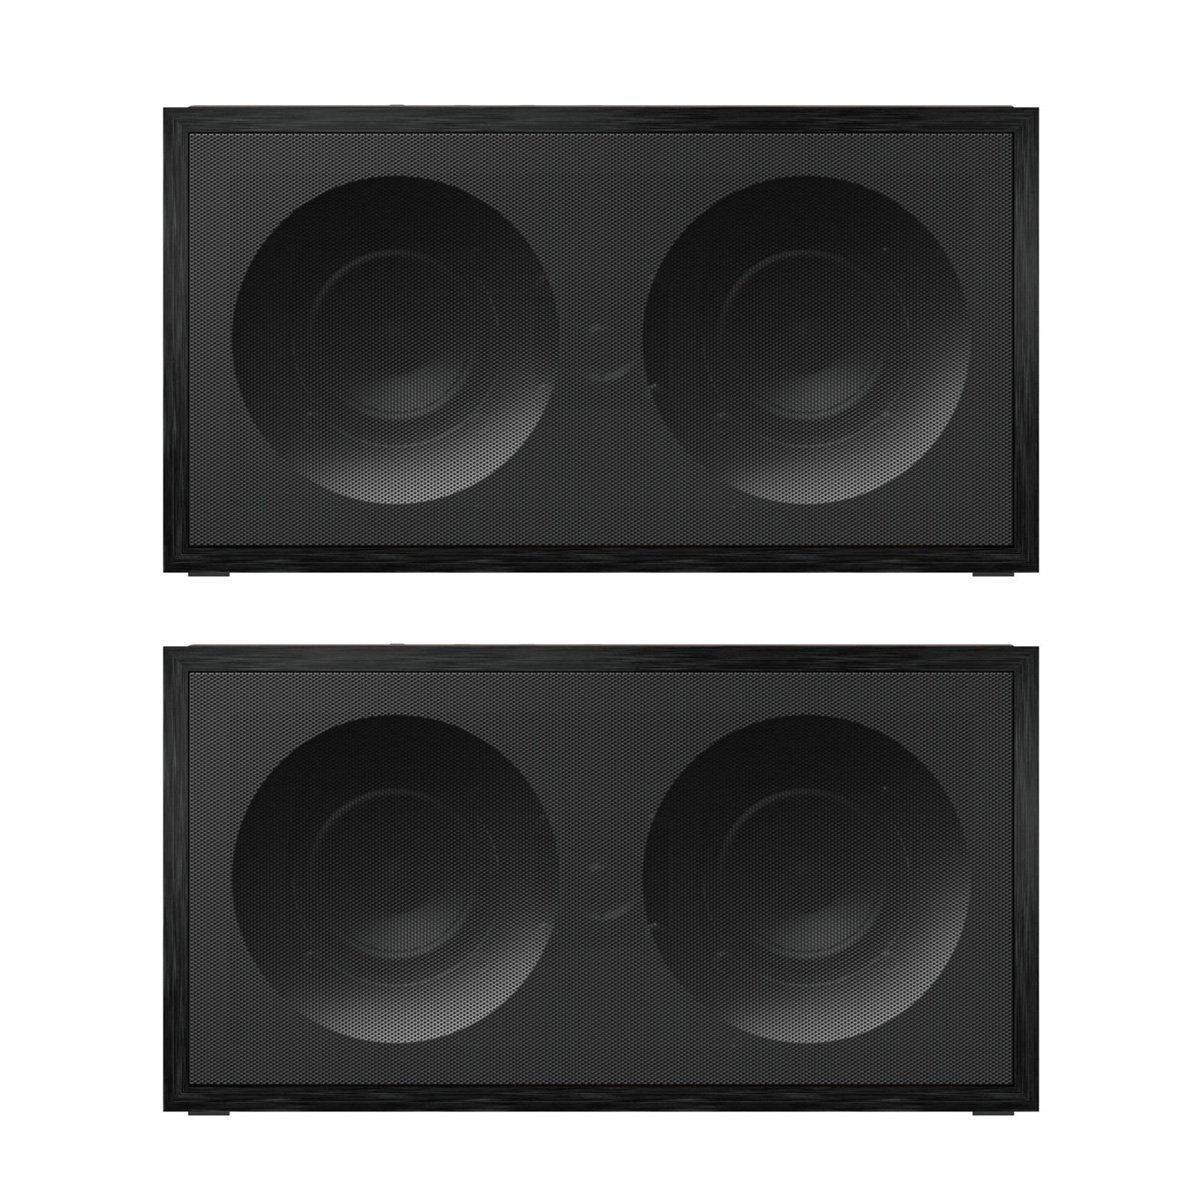 Onkyo NCP-302 Wireless Audio System - Pair (Black)